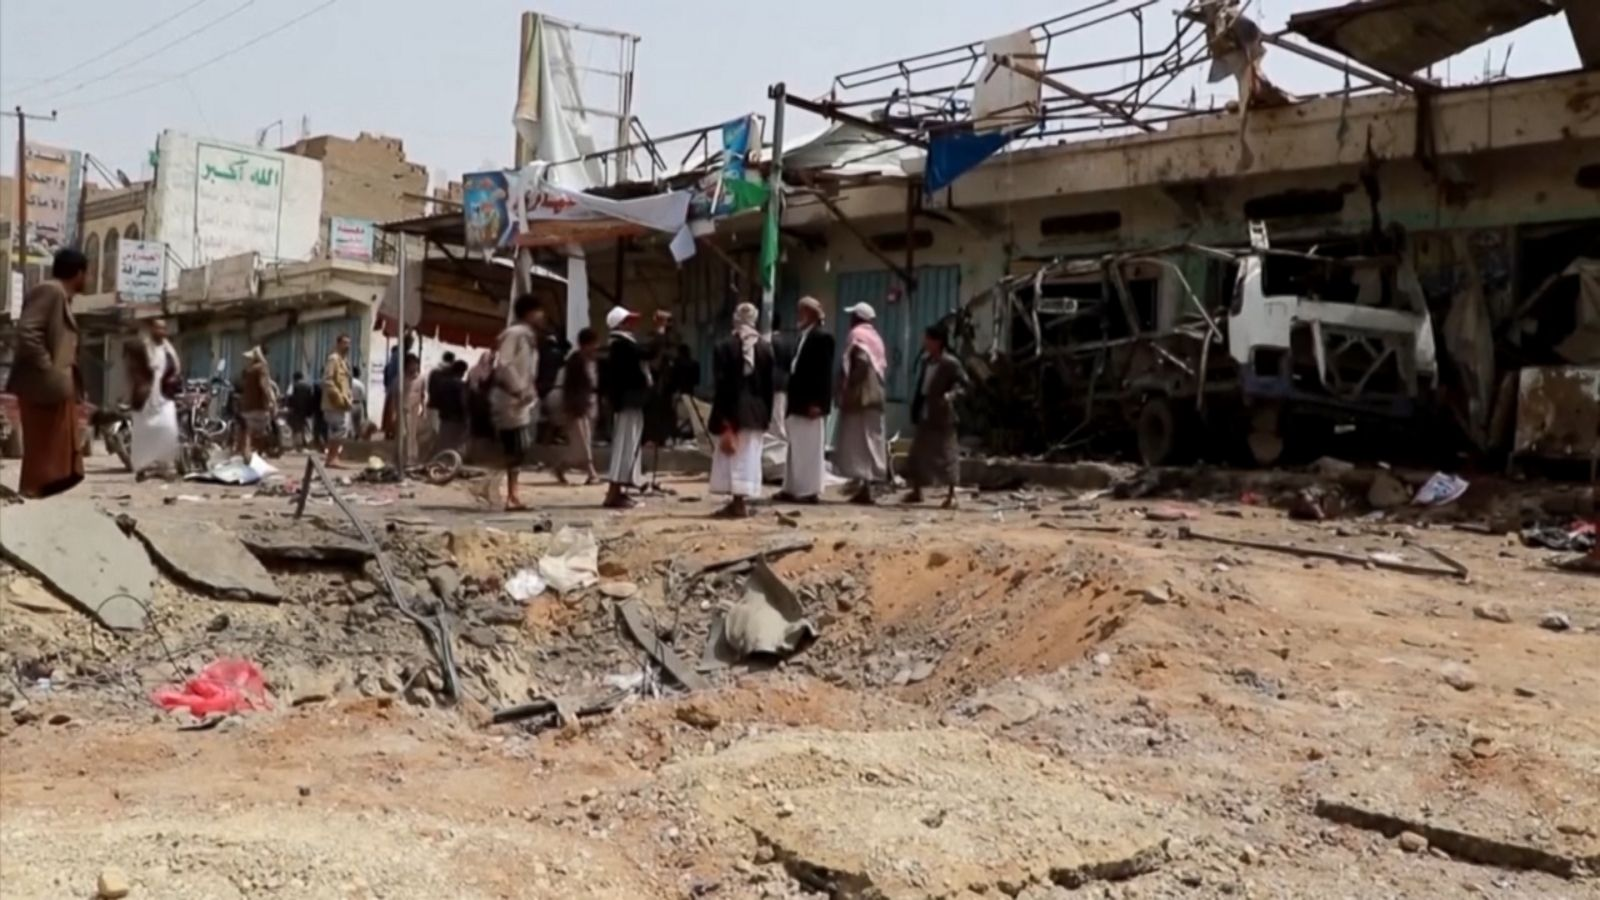 Saudi led coalition airstrike kills dozens of children on bus in yemen abc news